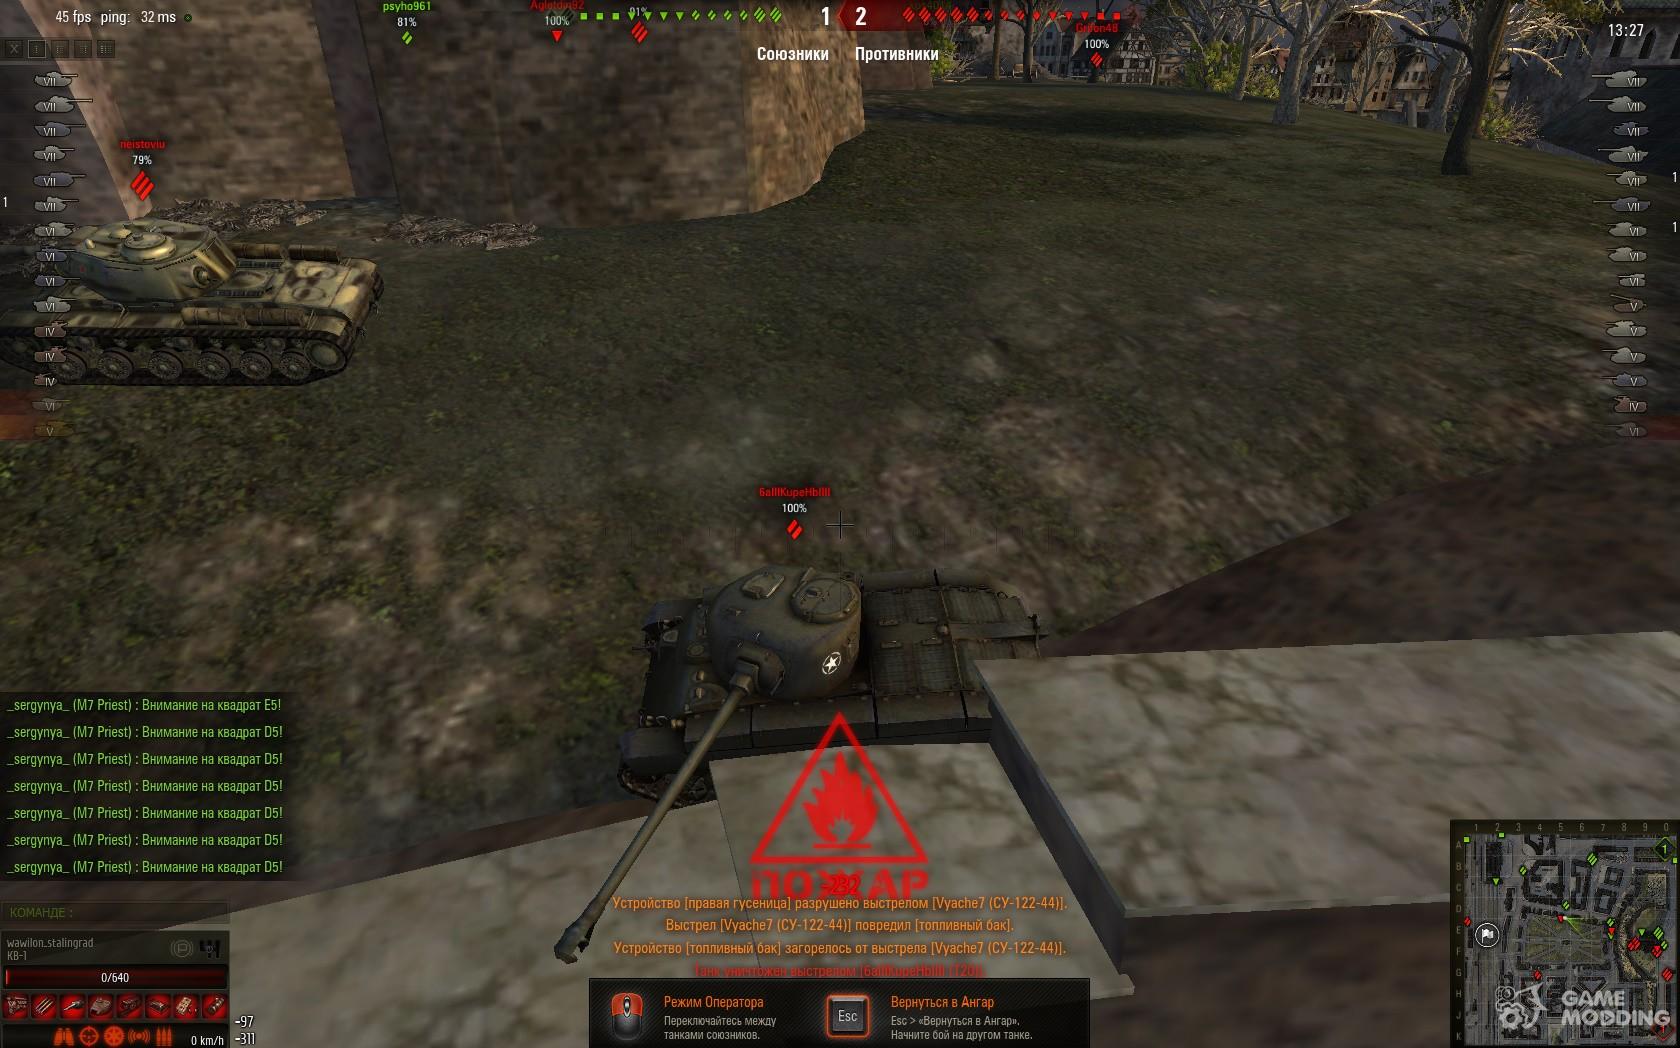 world of tanks panel mod